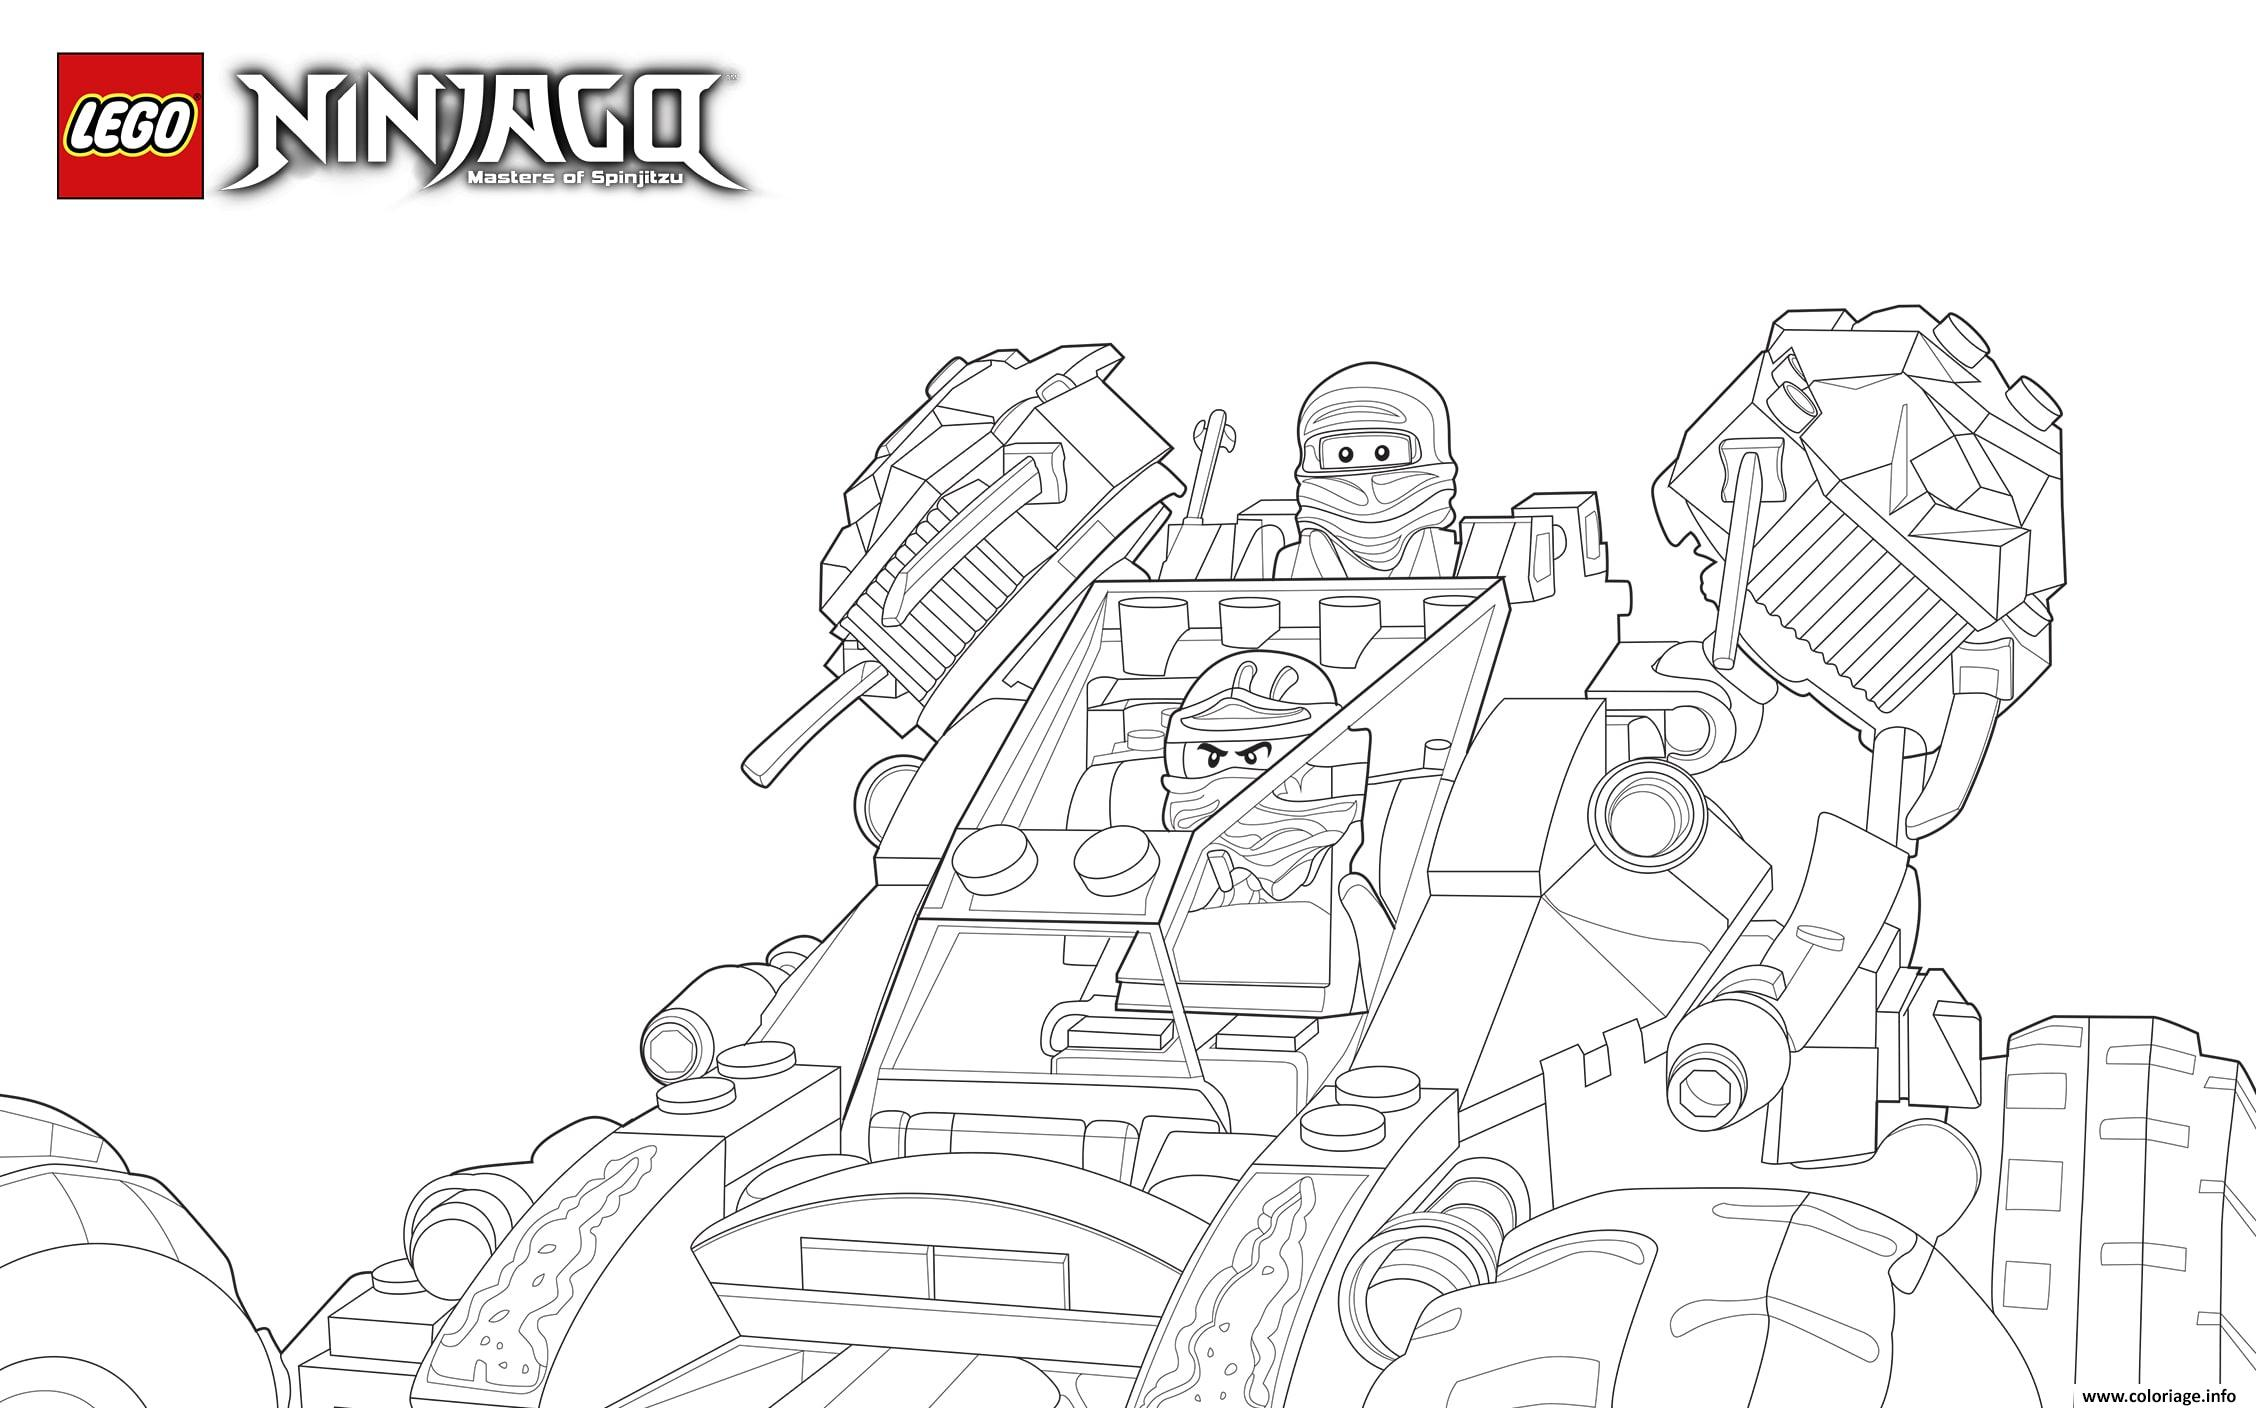 Dessin Lego Ninjago cole Jay tank Coloriage Gratuit à Imprimer